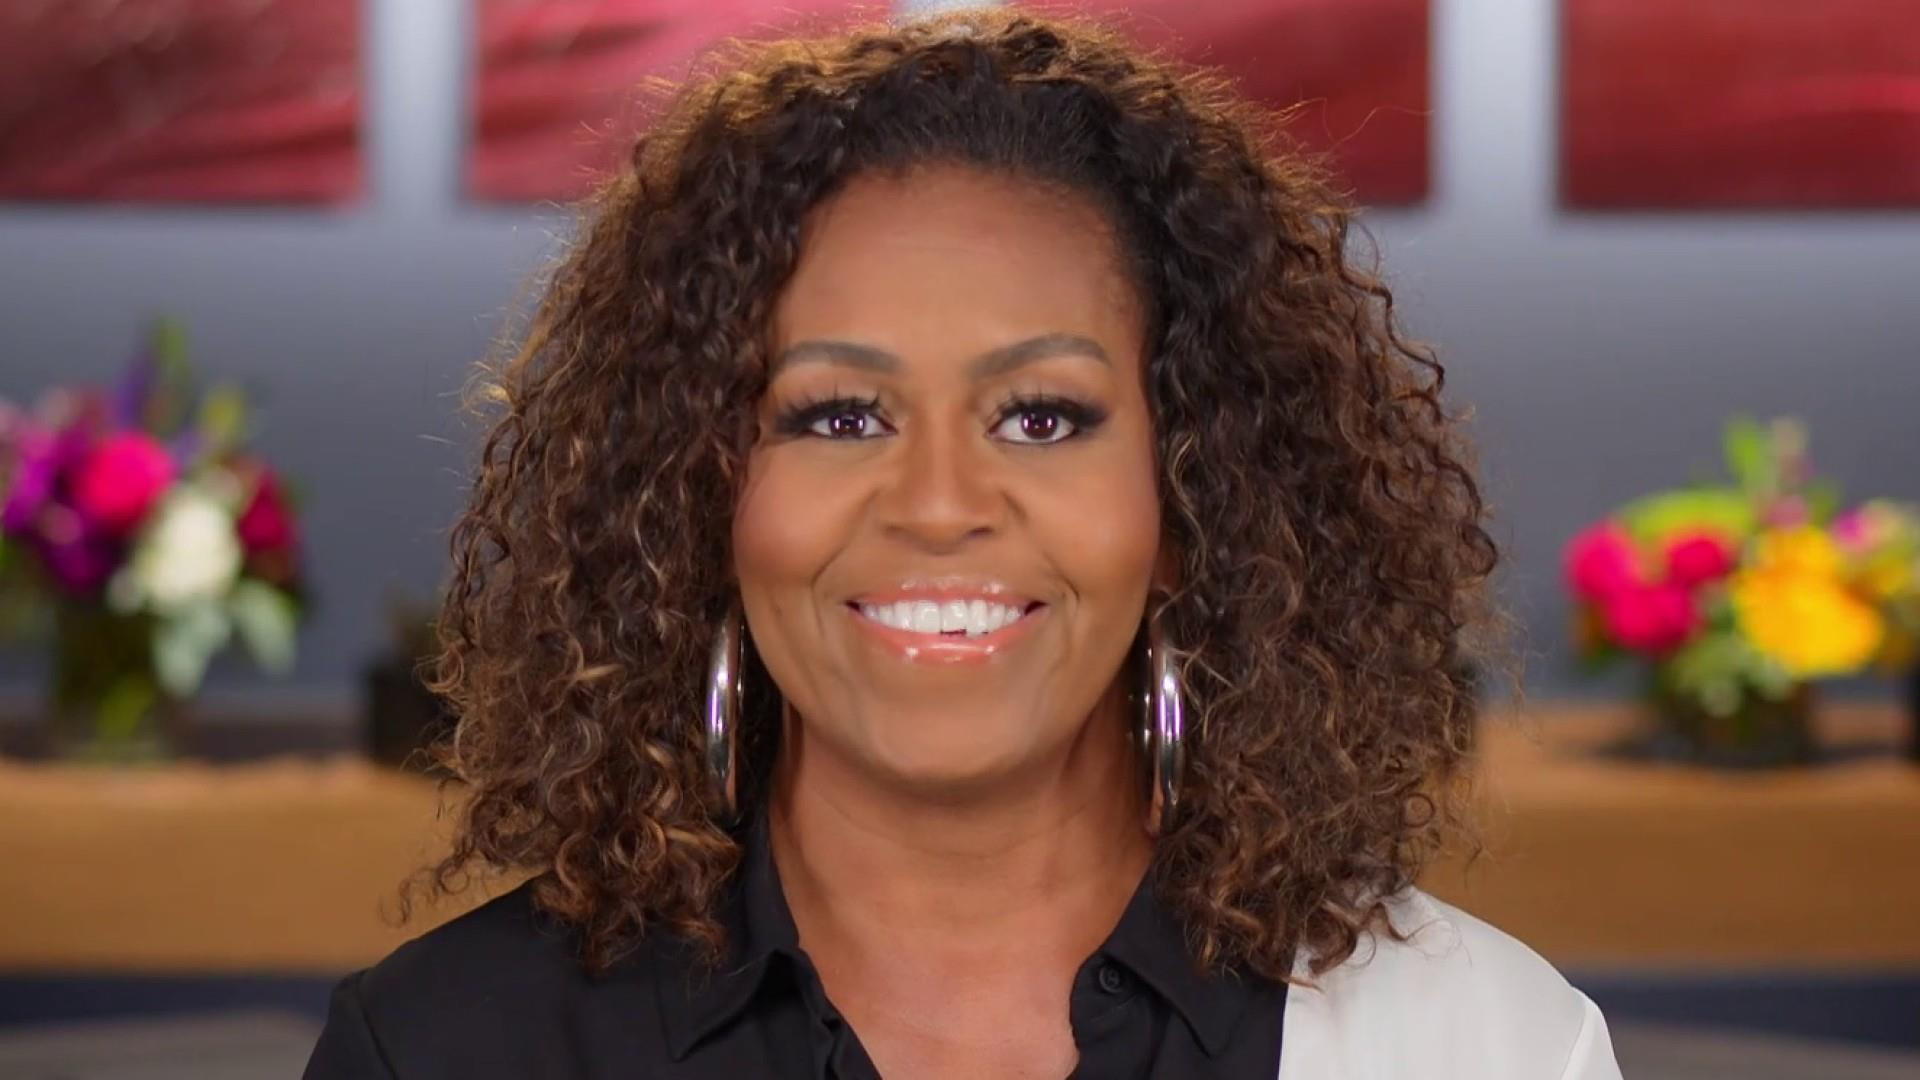 Michelle Obama to travel to Vietnam to spotlight girls' educators